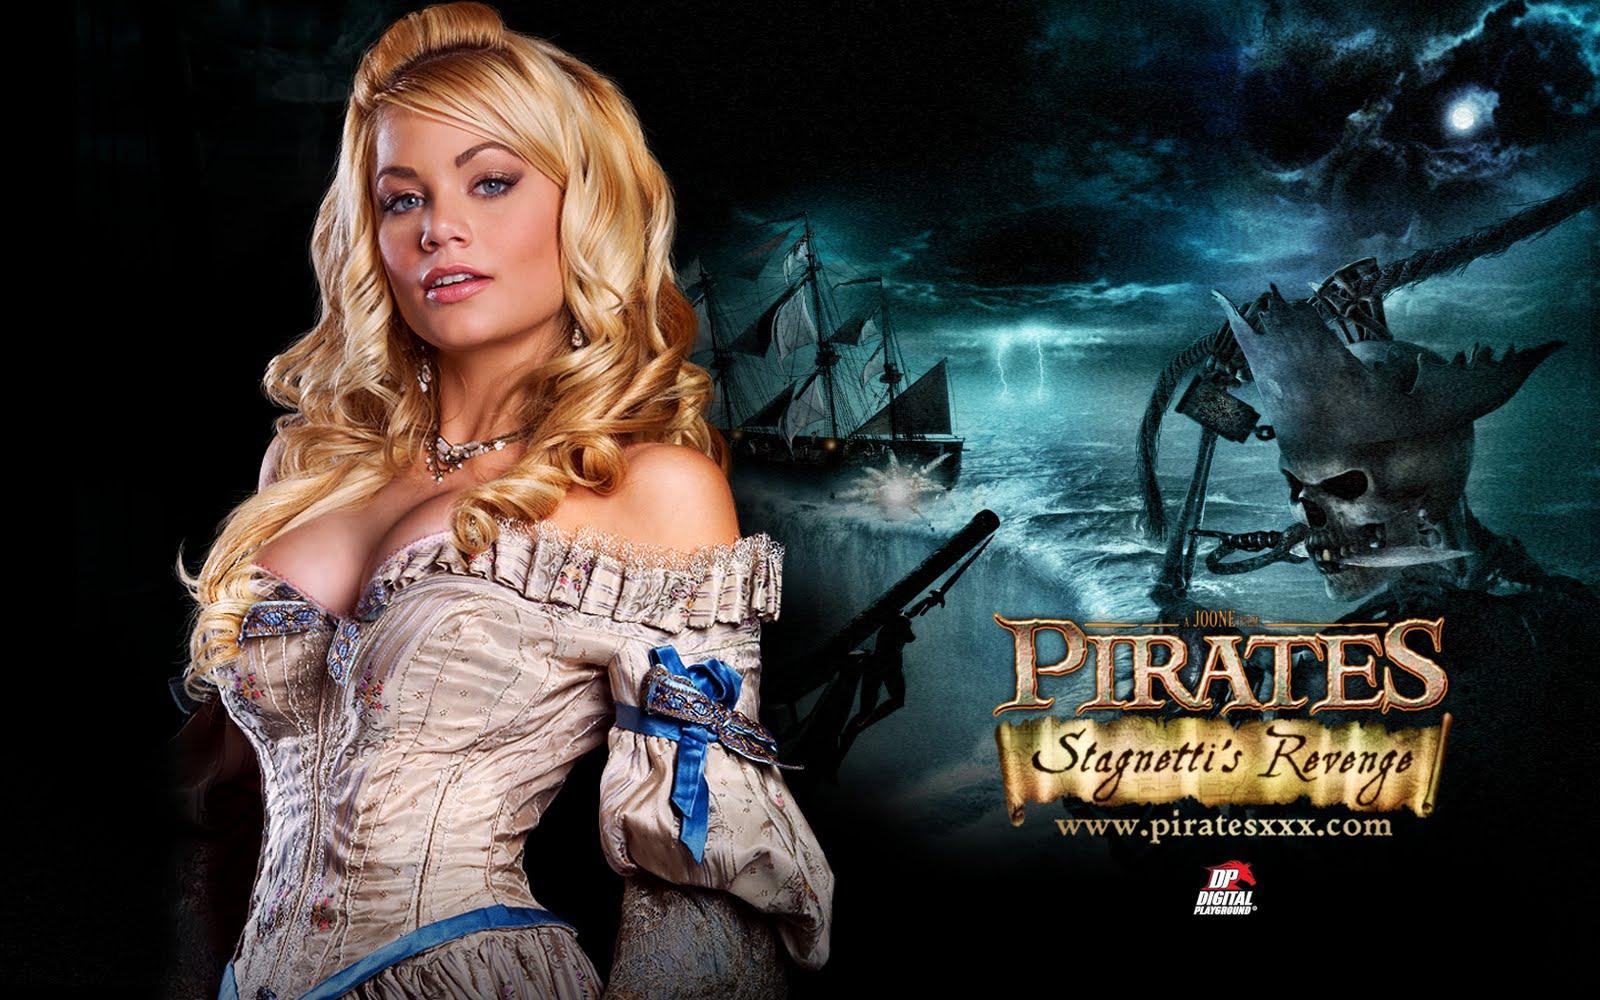 Riley steele pirates